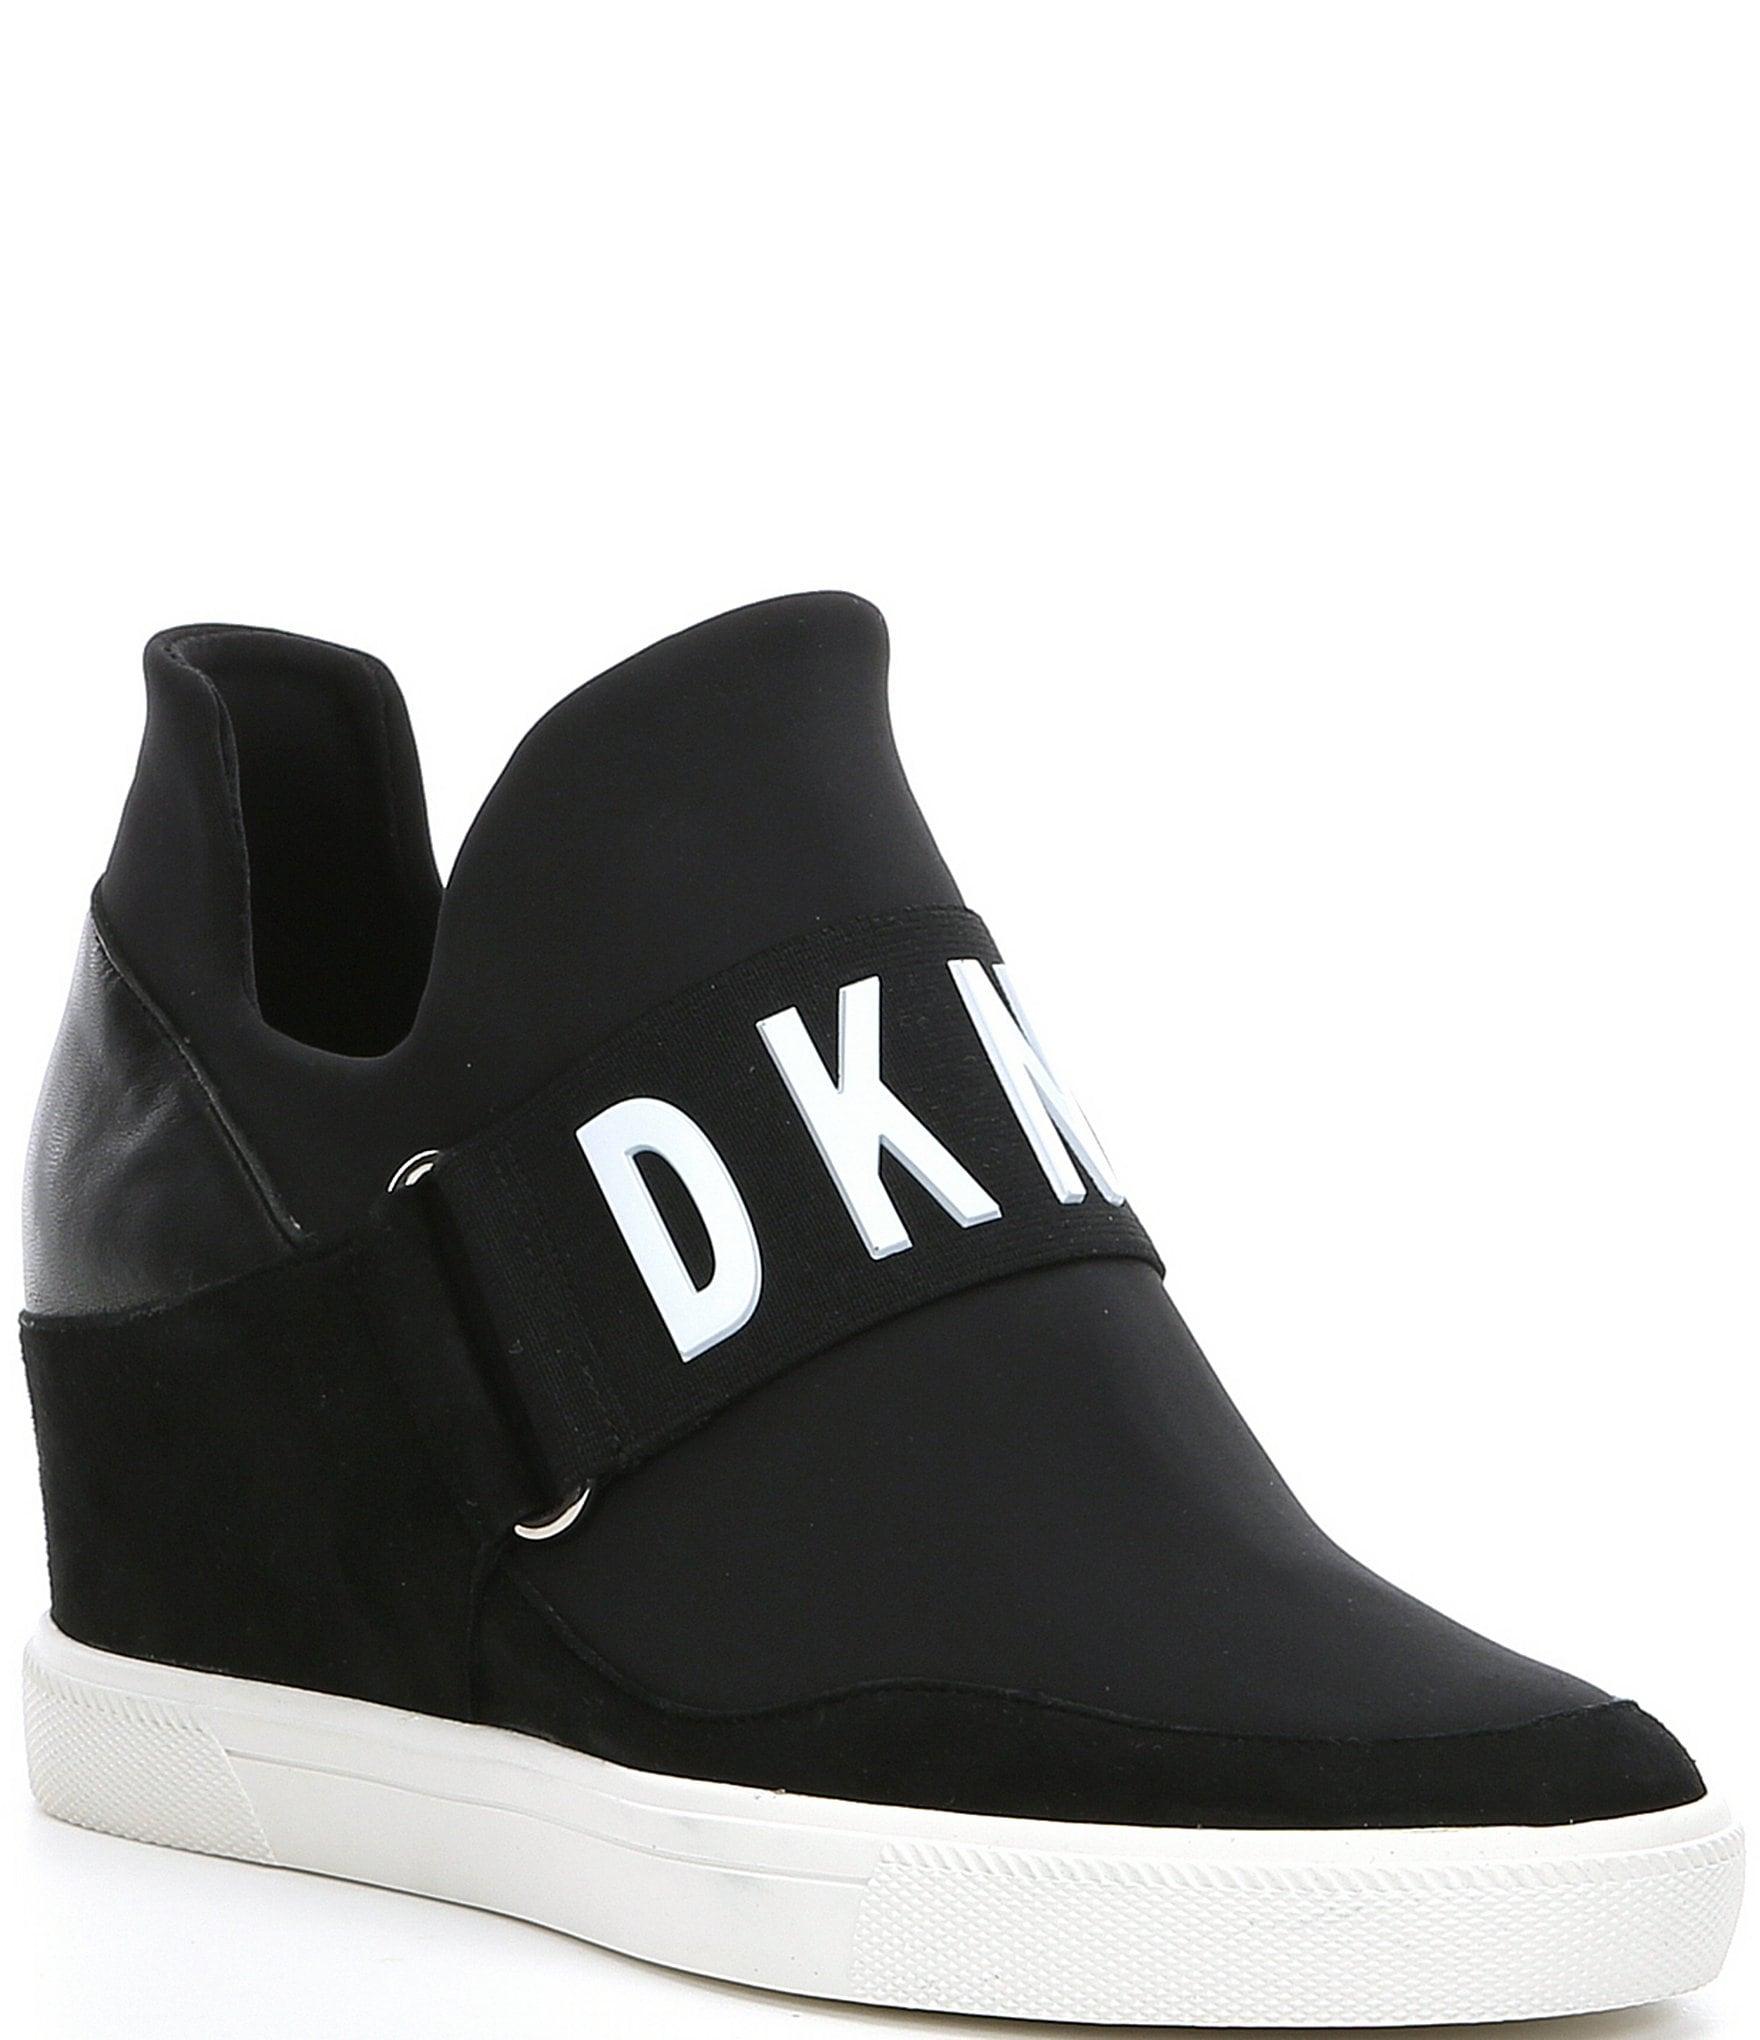 DKNY Cosmos Logo Hidden Wedge Slip On